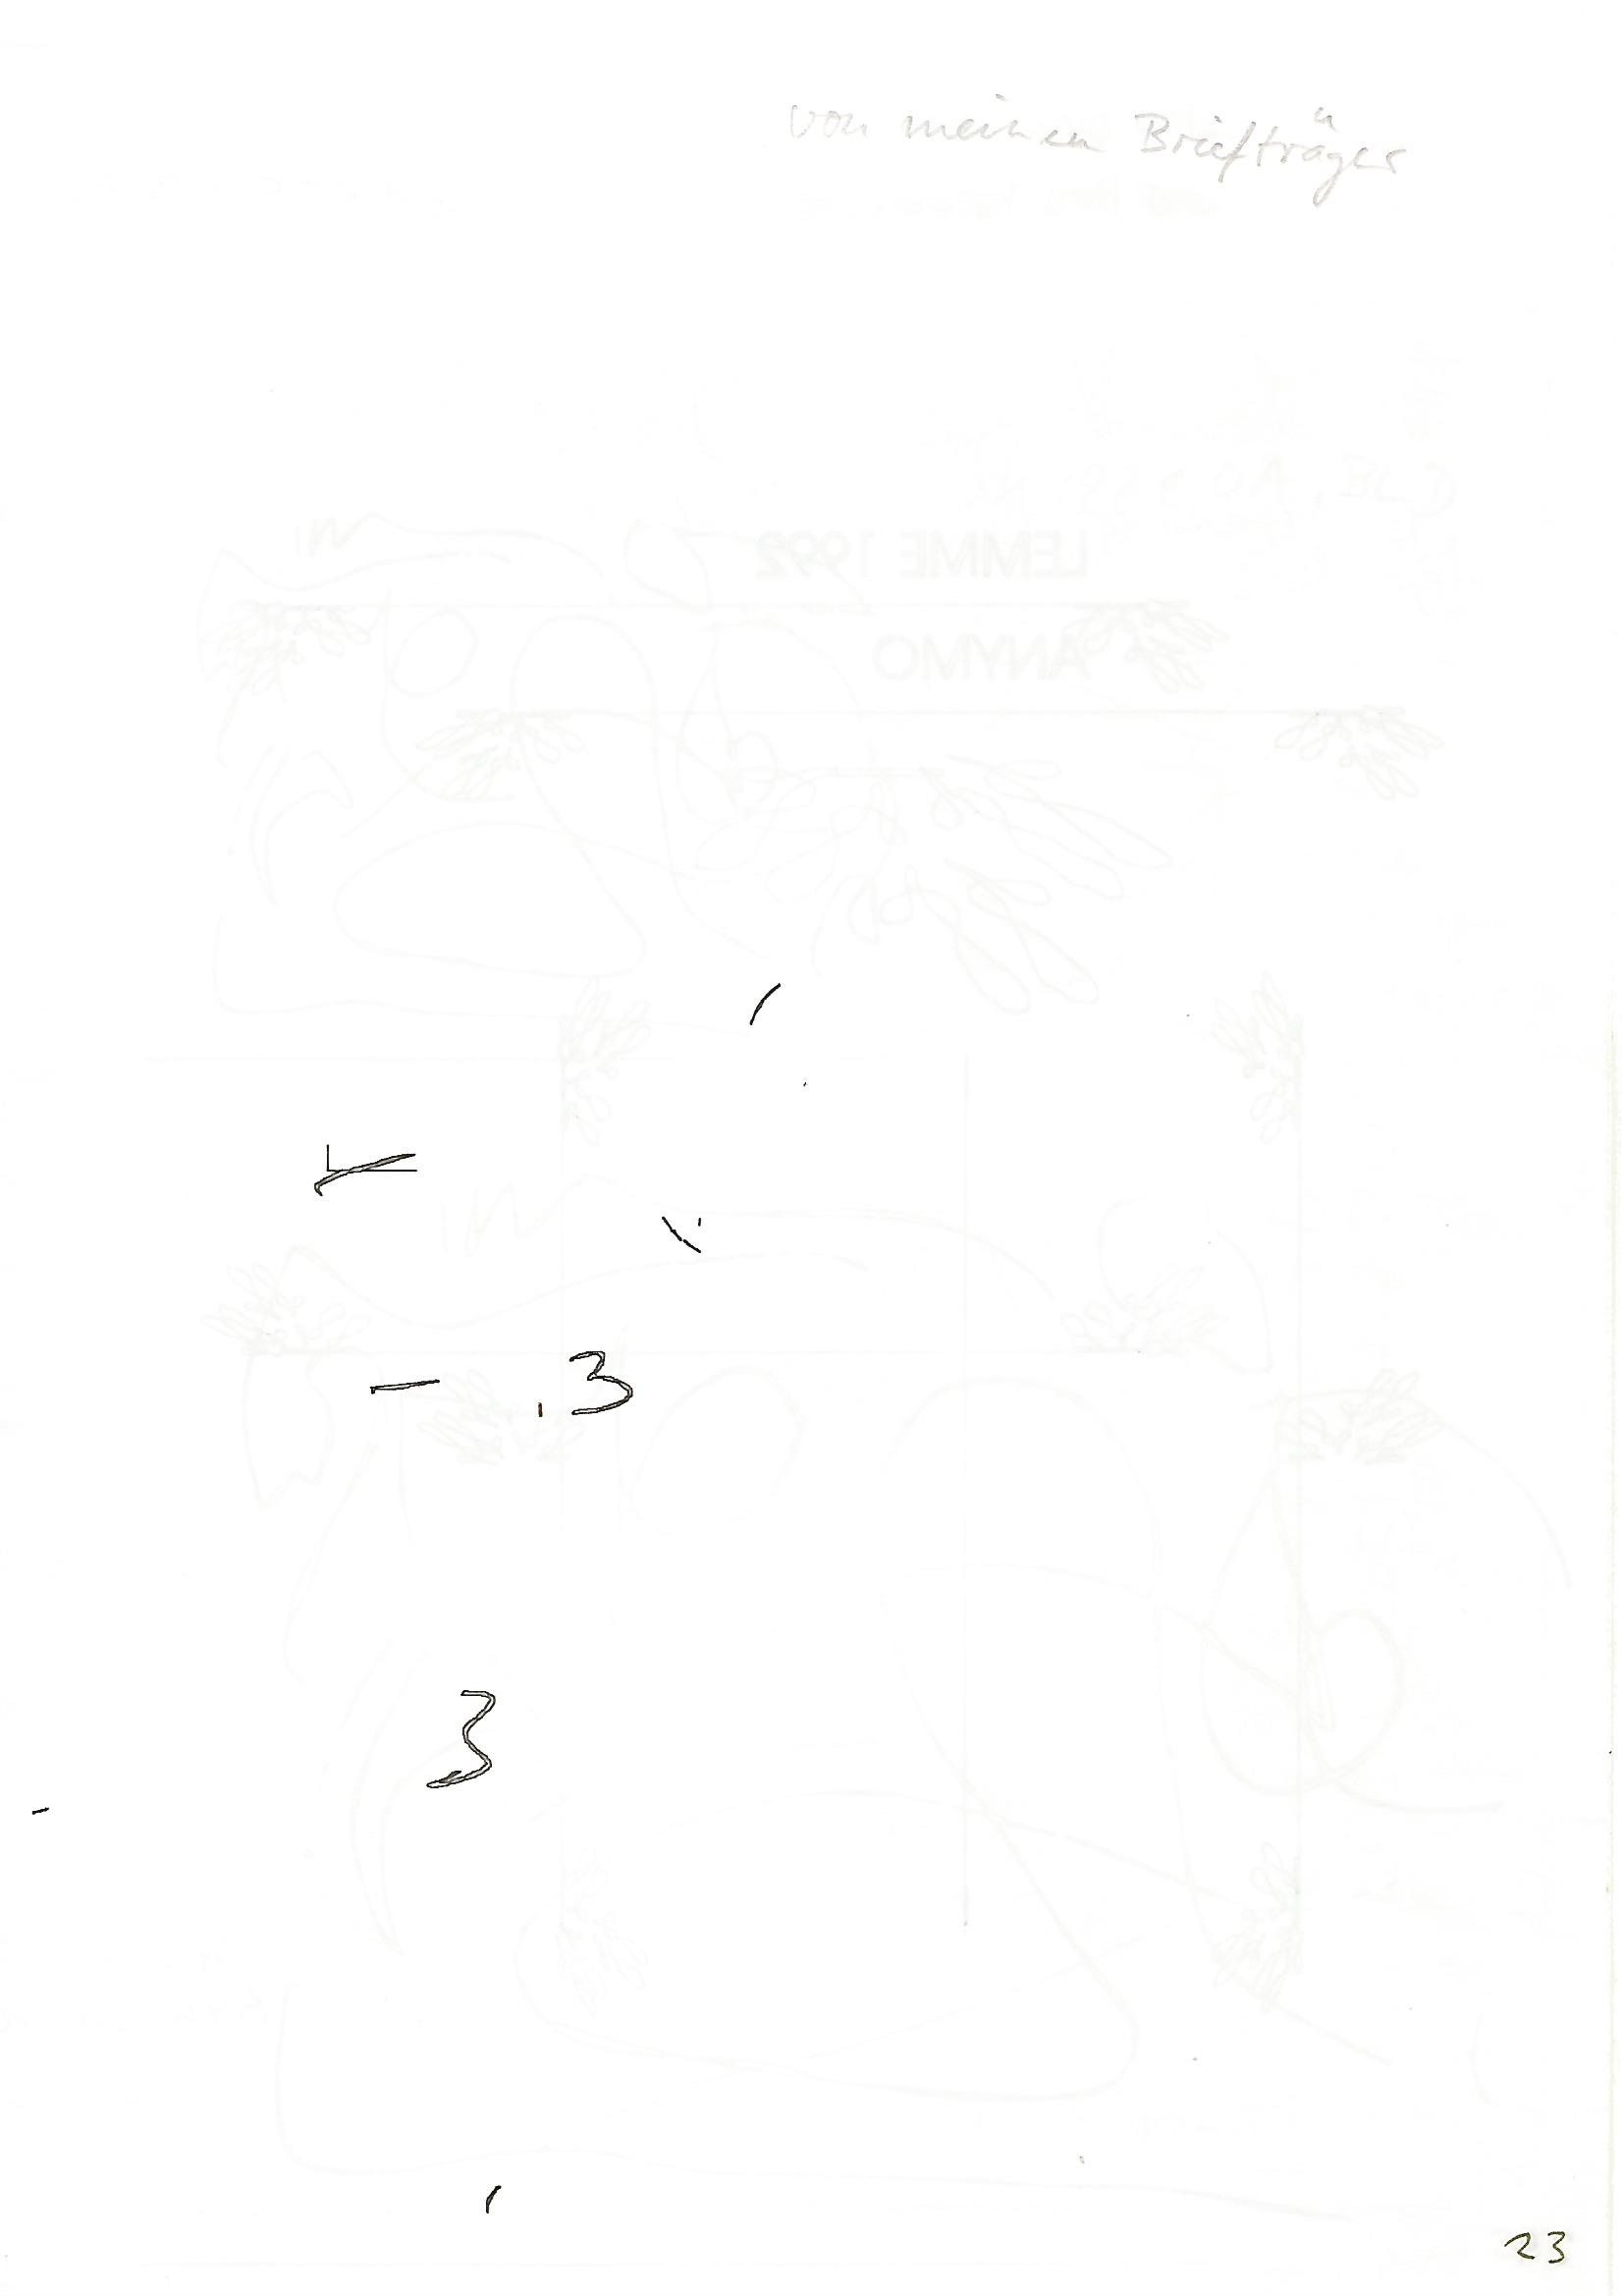 p941104_25